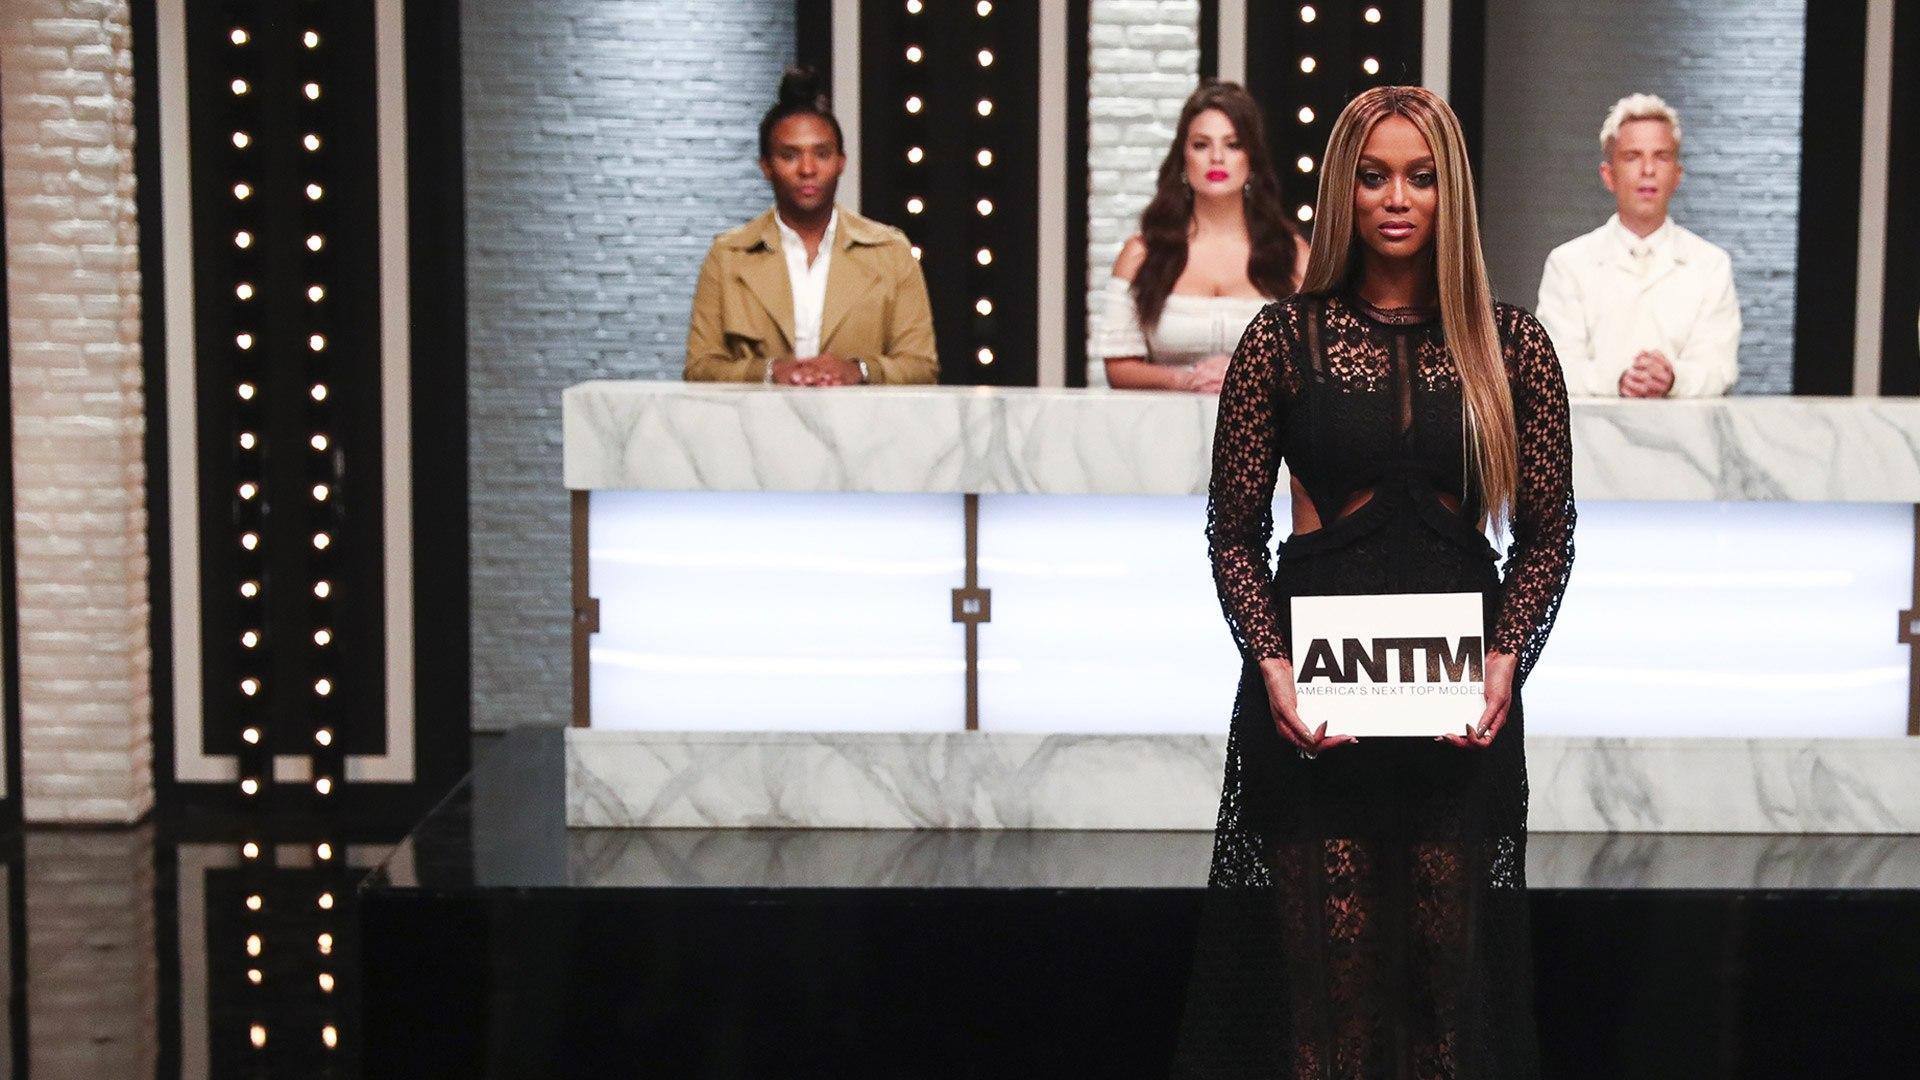 Sky Uno +1 HD America's Next Top Model -  - 1^TV